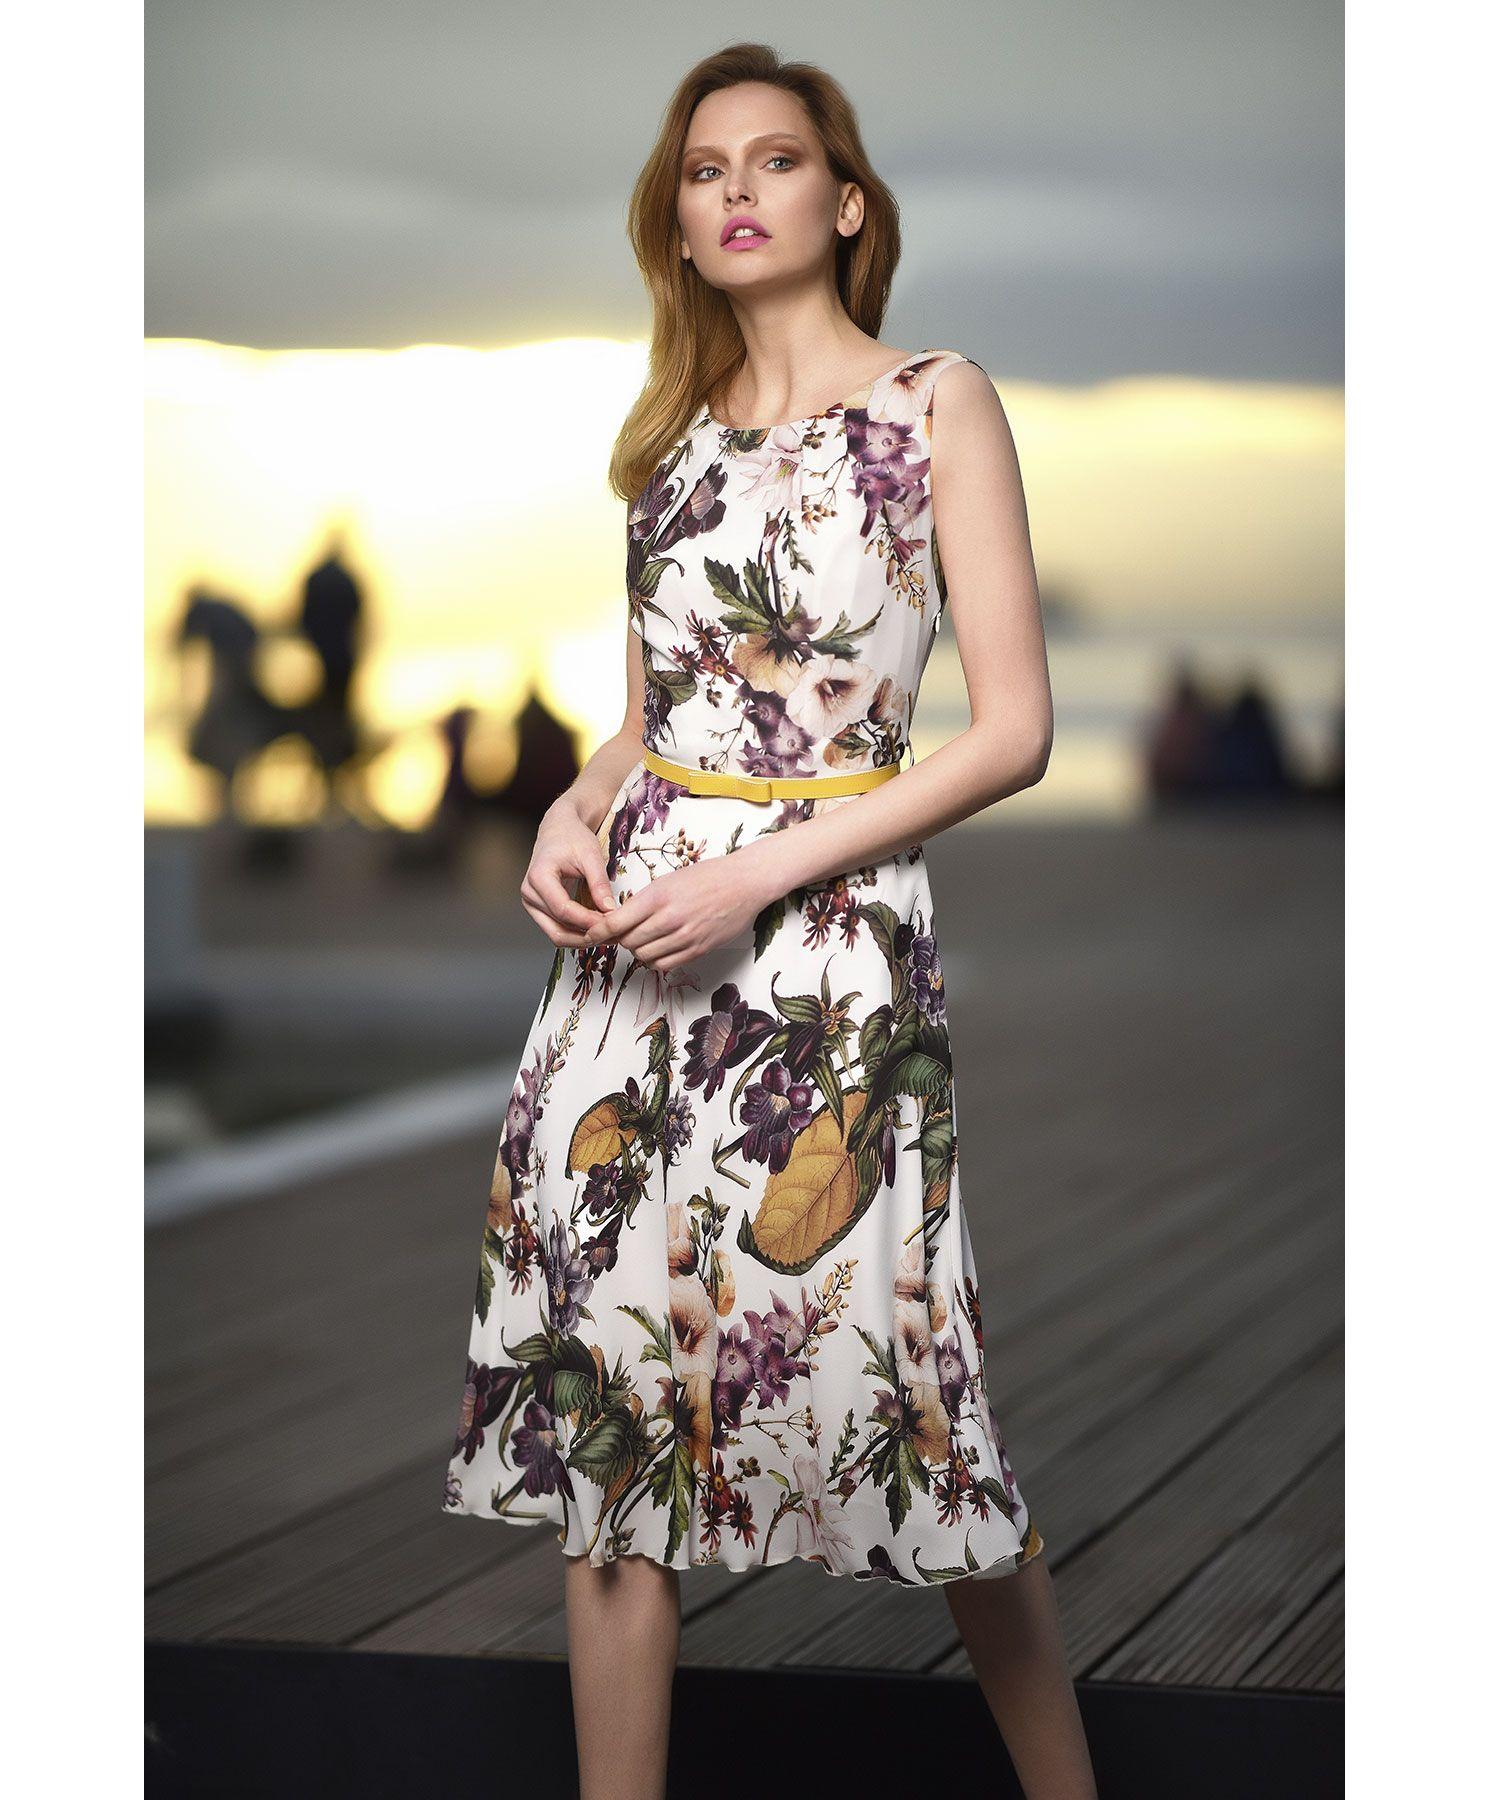 a931ae030511 Φόρεμα φλοράλ μουσελίνα